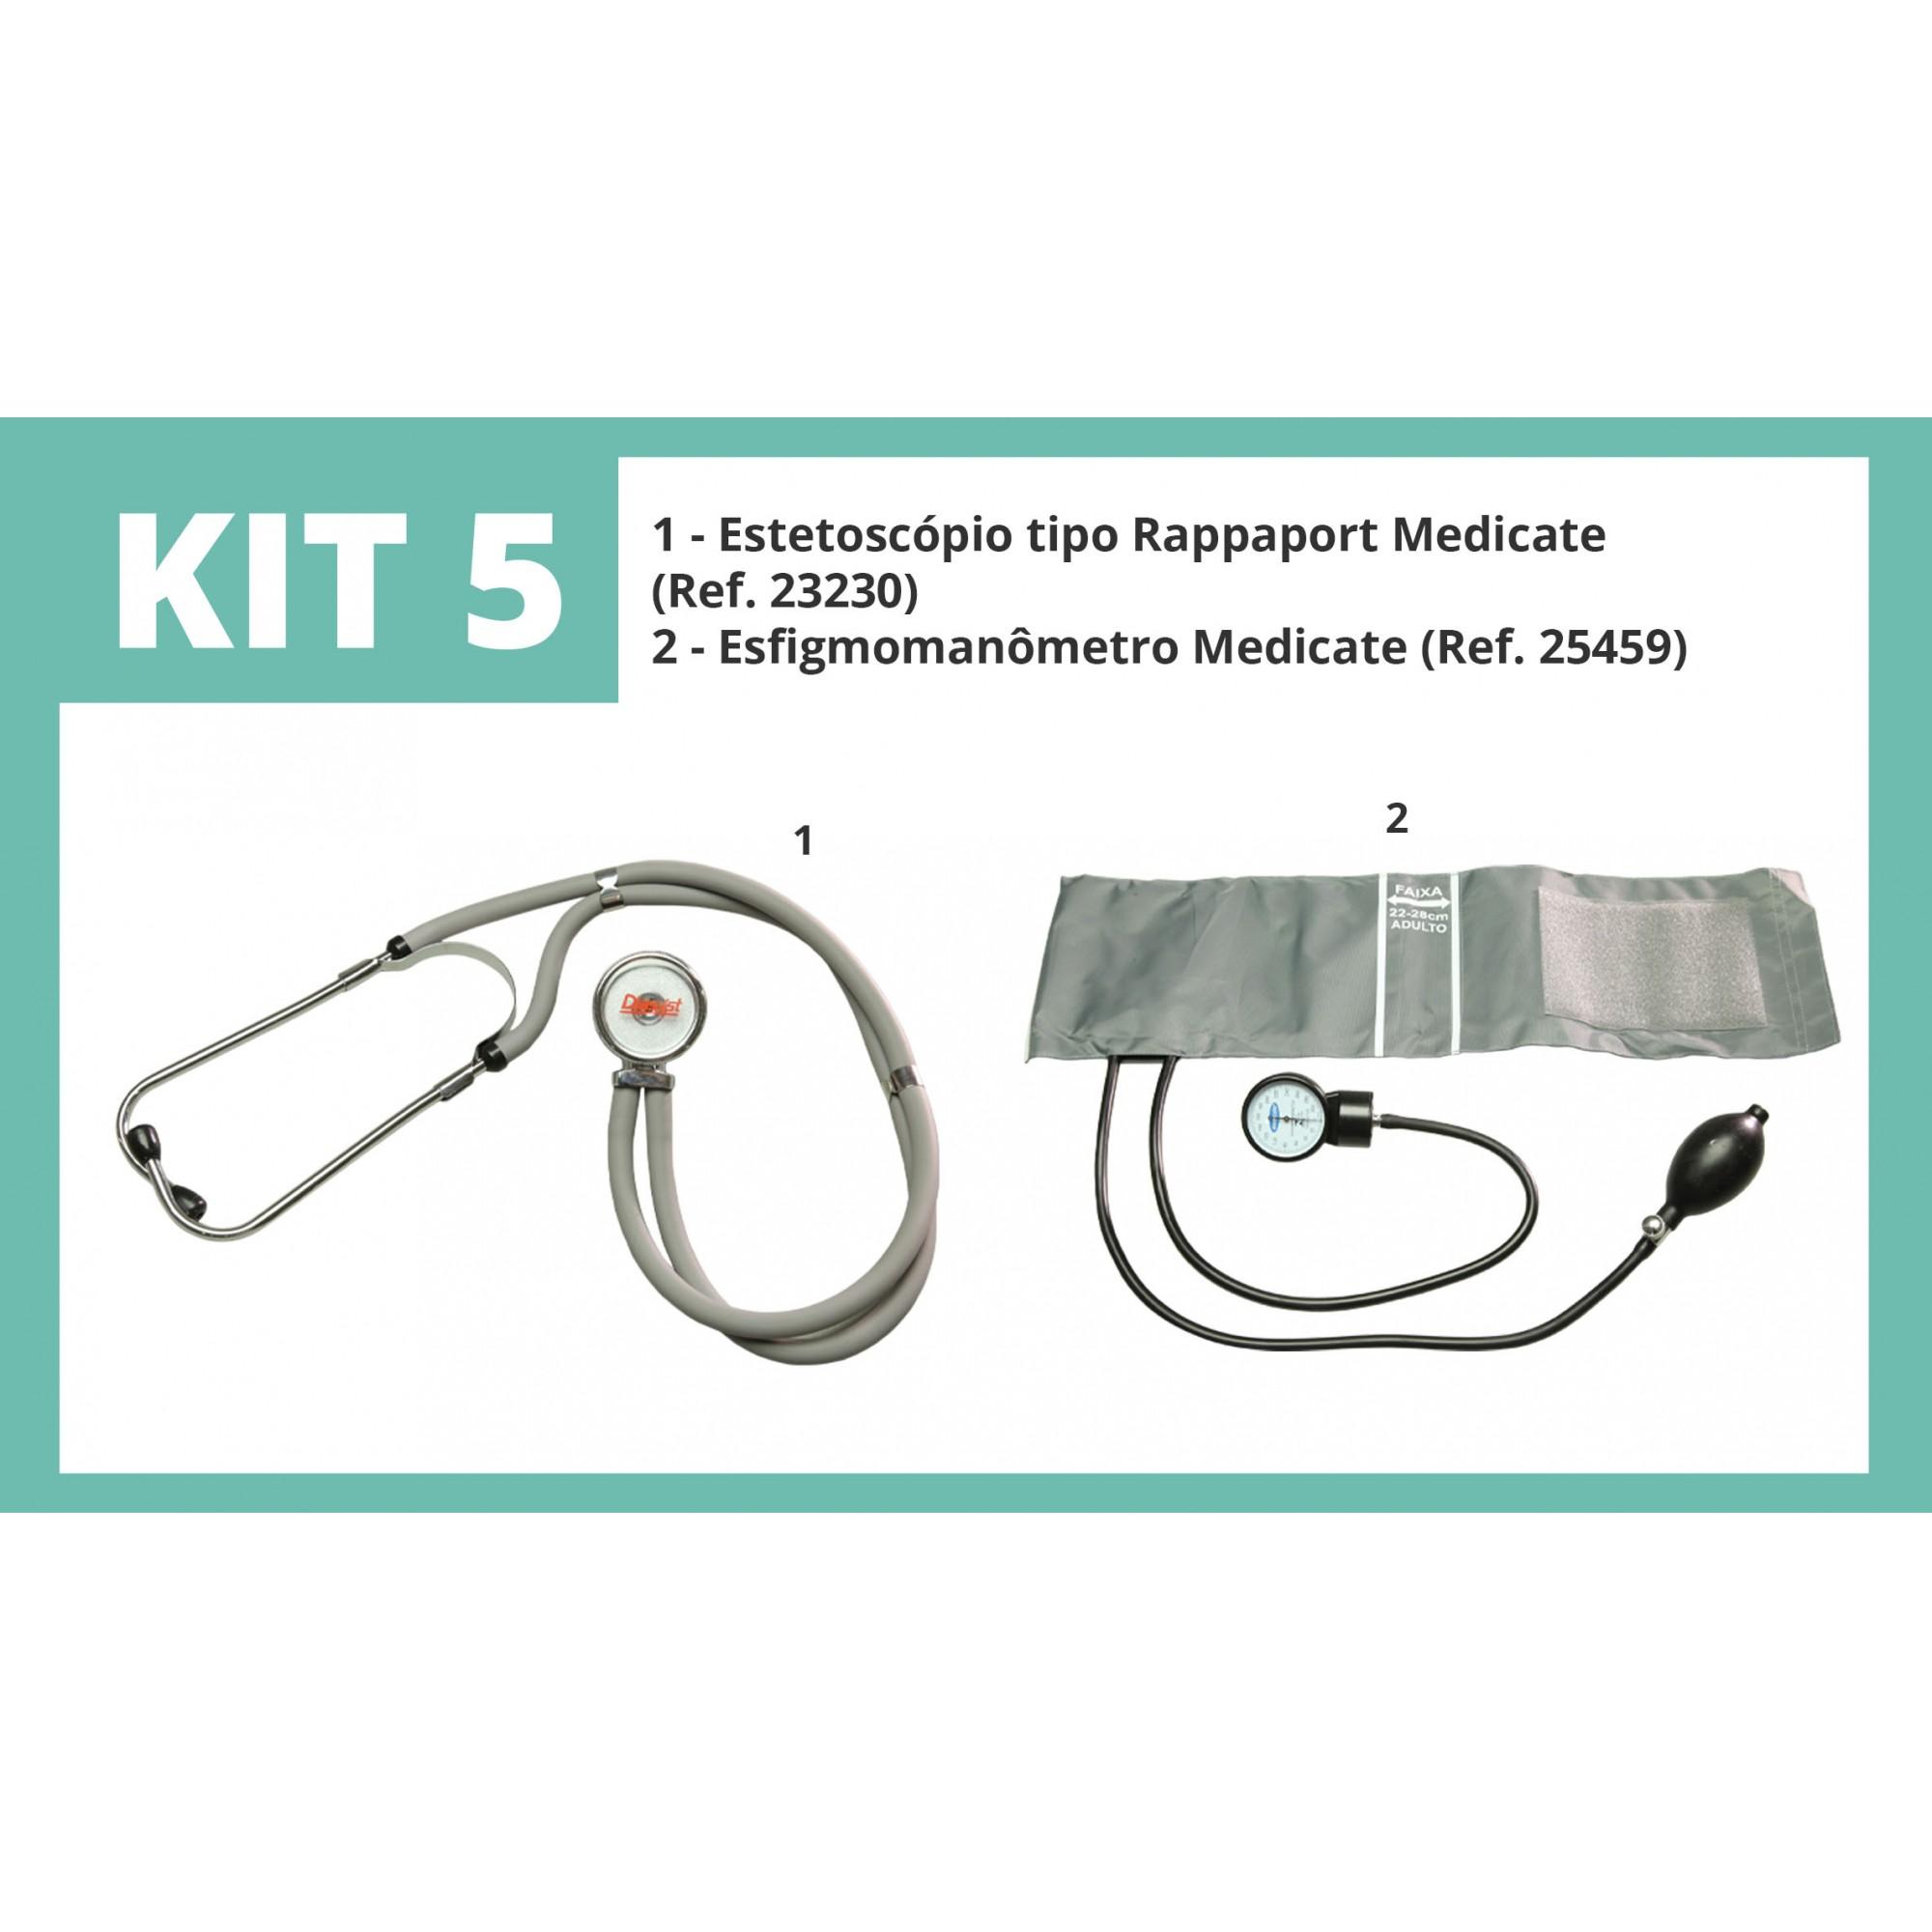 Kit 5 - Estetoscópio tipo Rappaport Medicate+ Esfigmomanômetro Medicate